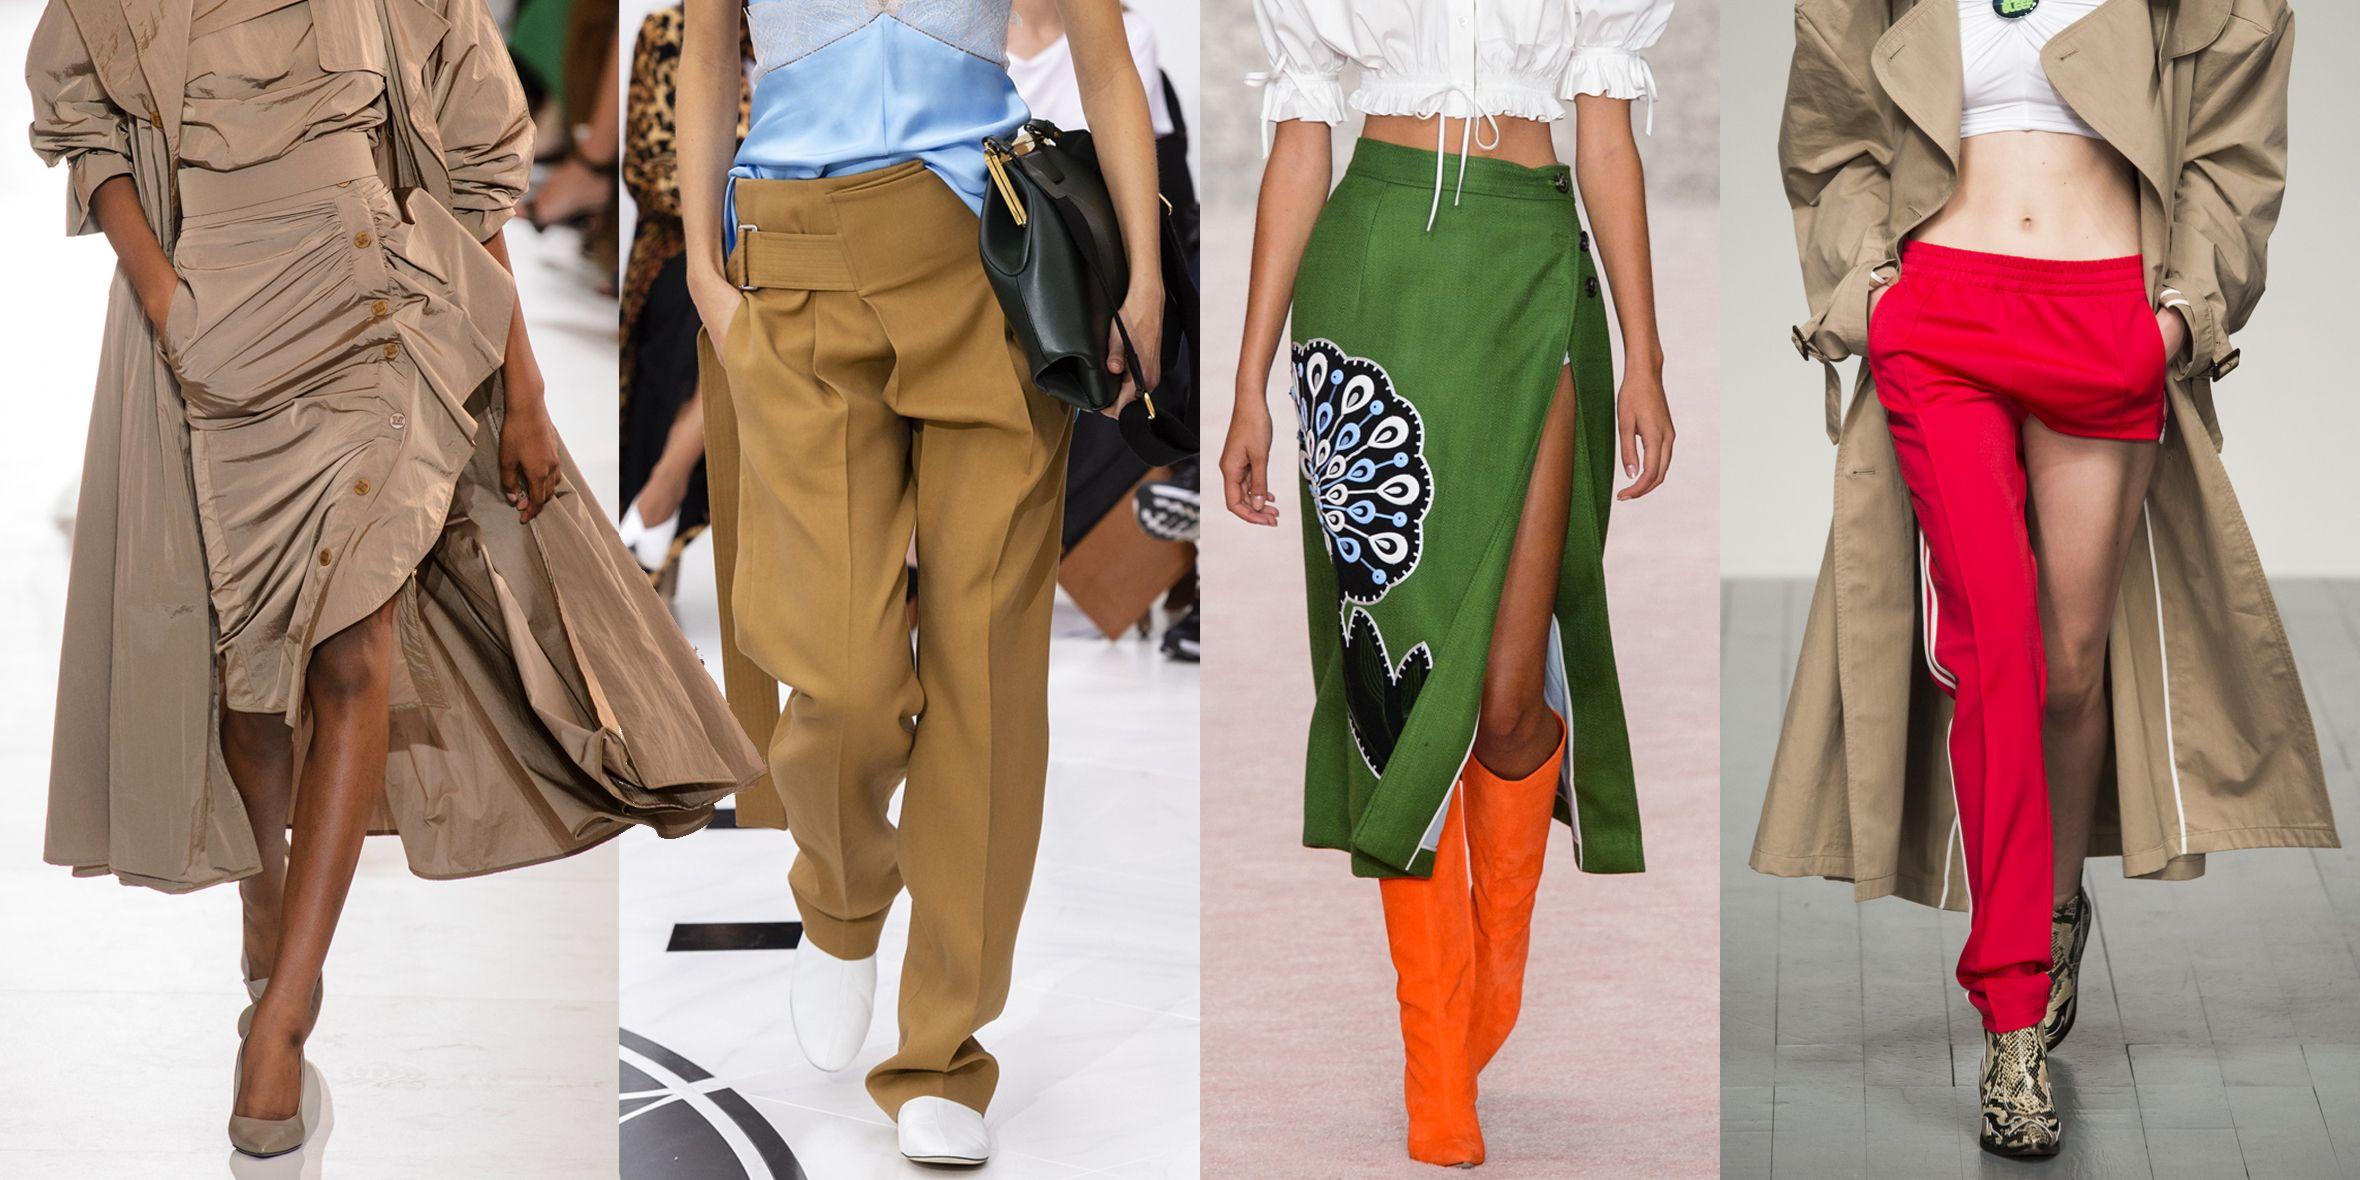 Le Moda Primavera Estate I Pantaloni 2019 Gonne E 29DHIE